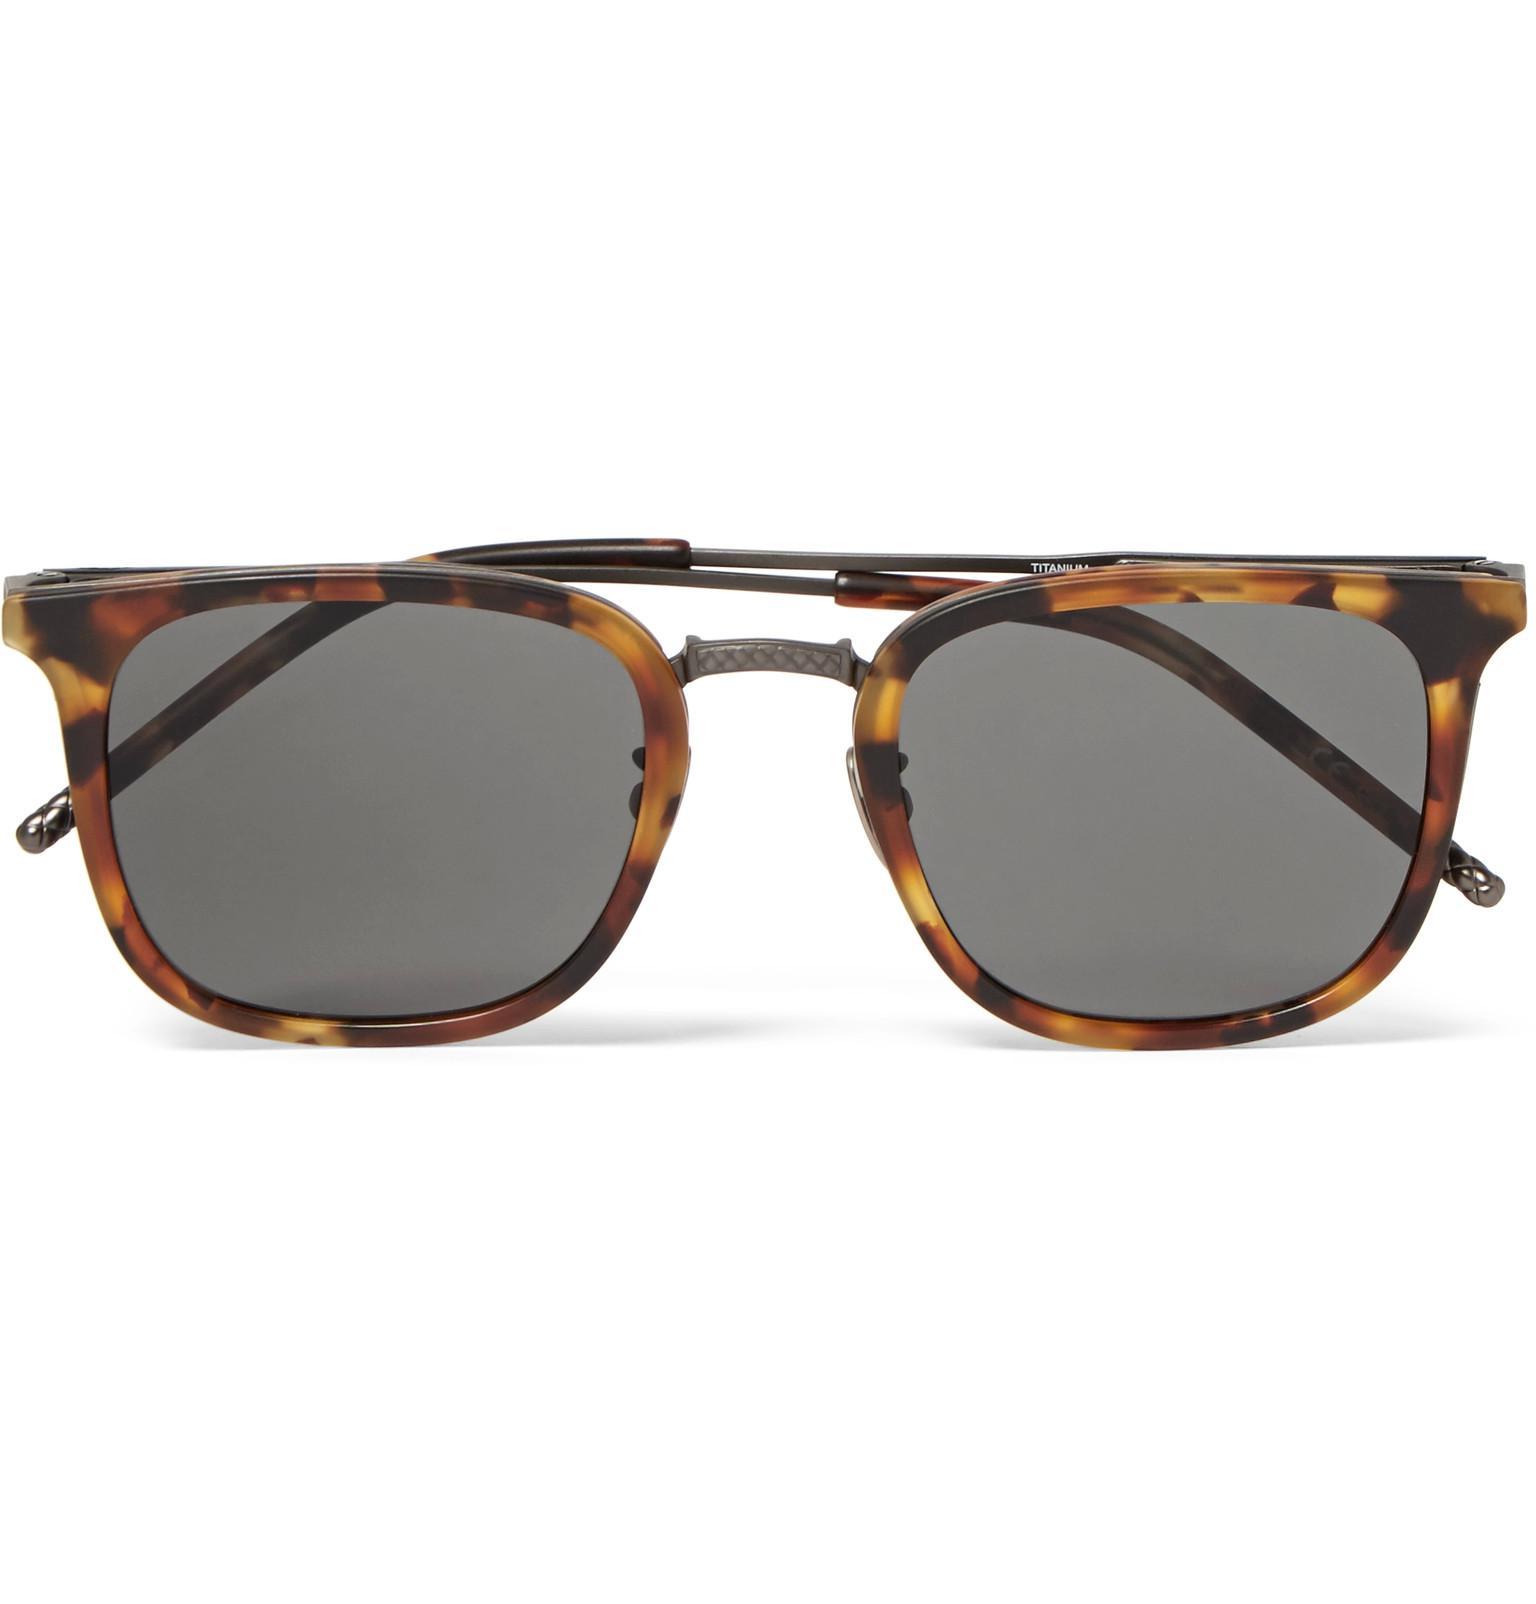 Bottega Veneta Square-frame Tortoiseshell Acetate And Gunmetal-tone Sunglasses - Brown cnQkN0ujNB